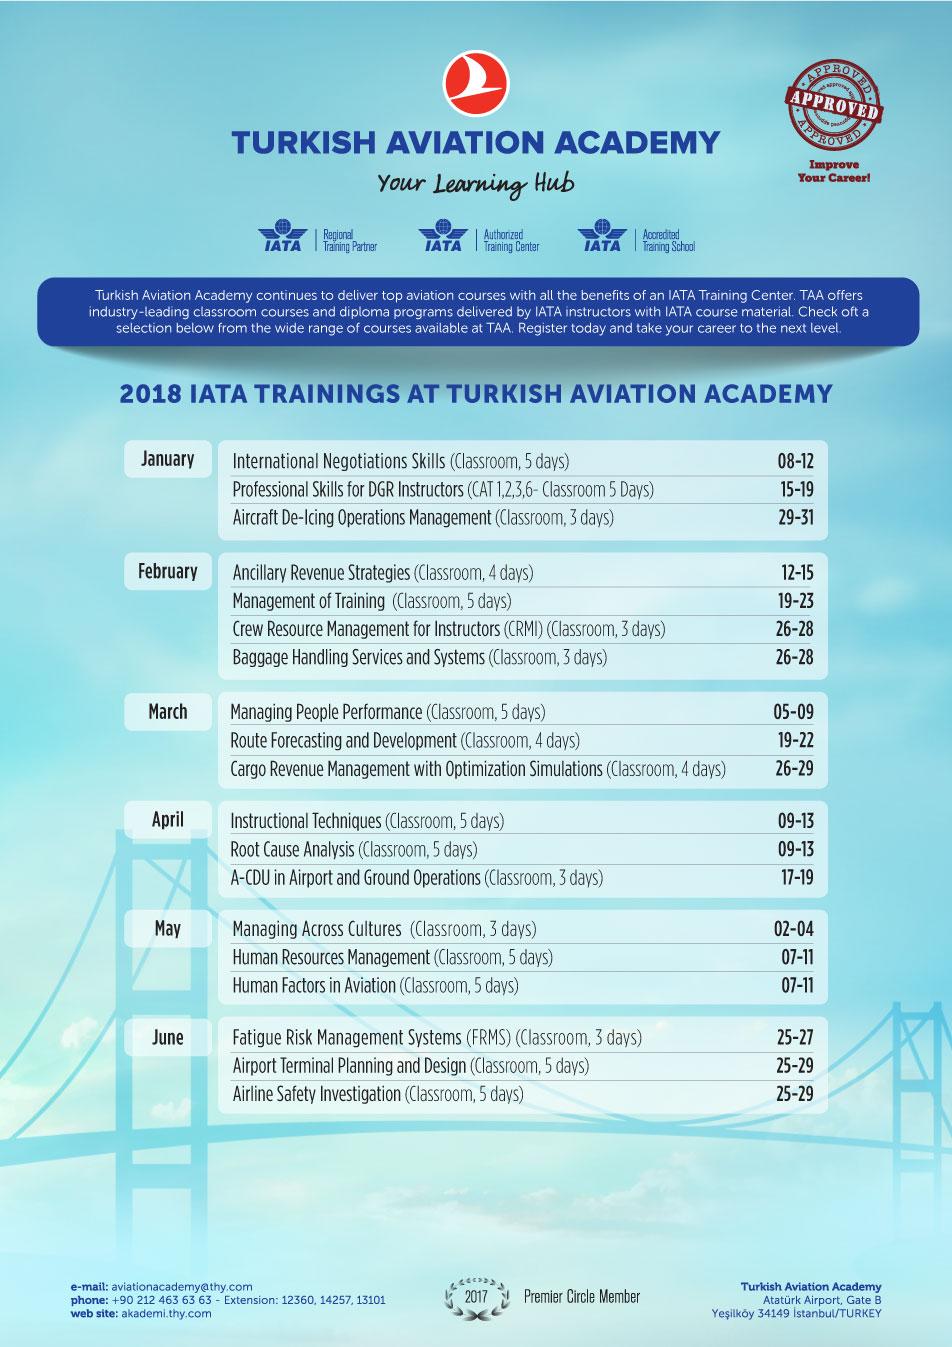 TURKISH AVIATION ACADEMY HAS SET THE 2018 IATA TRAINING